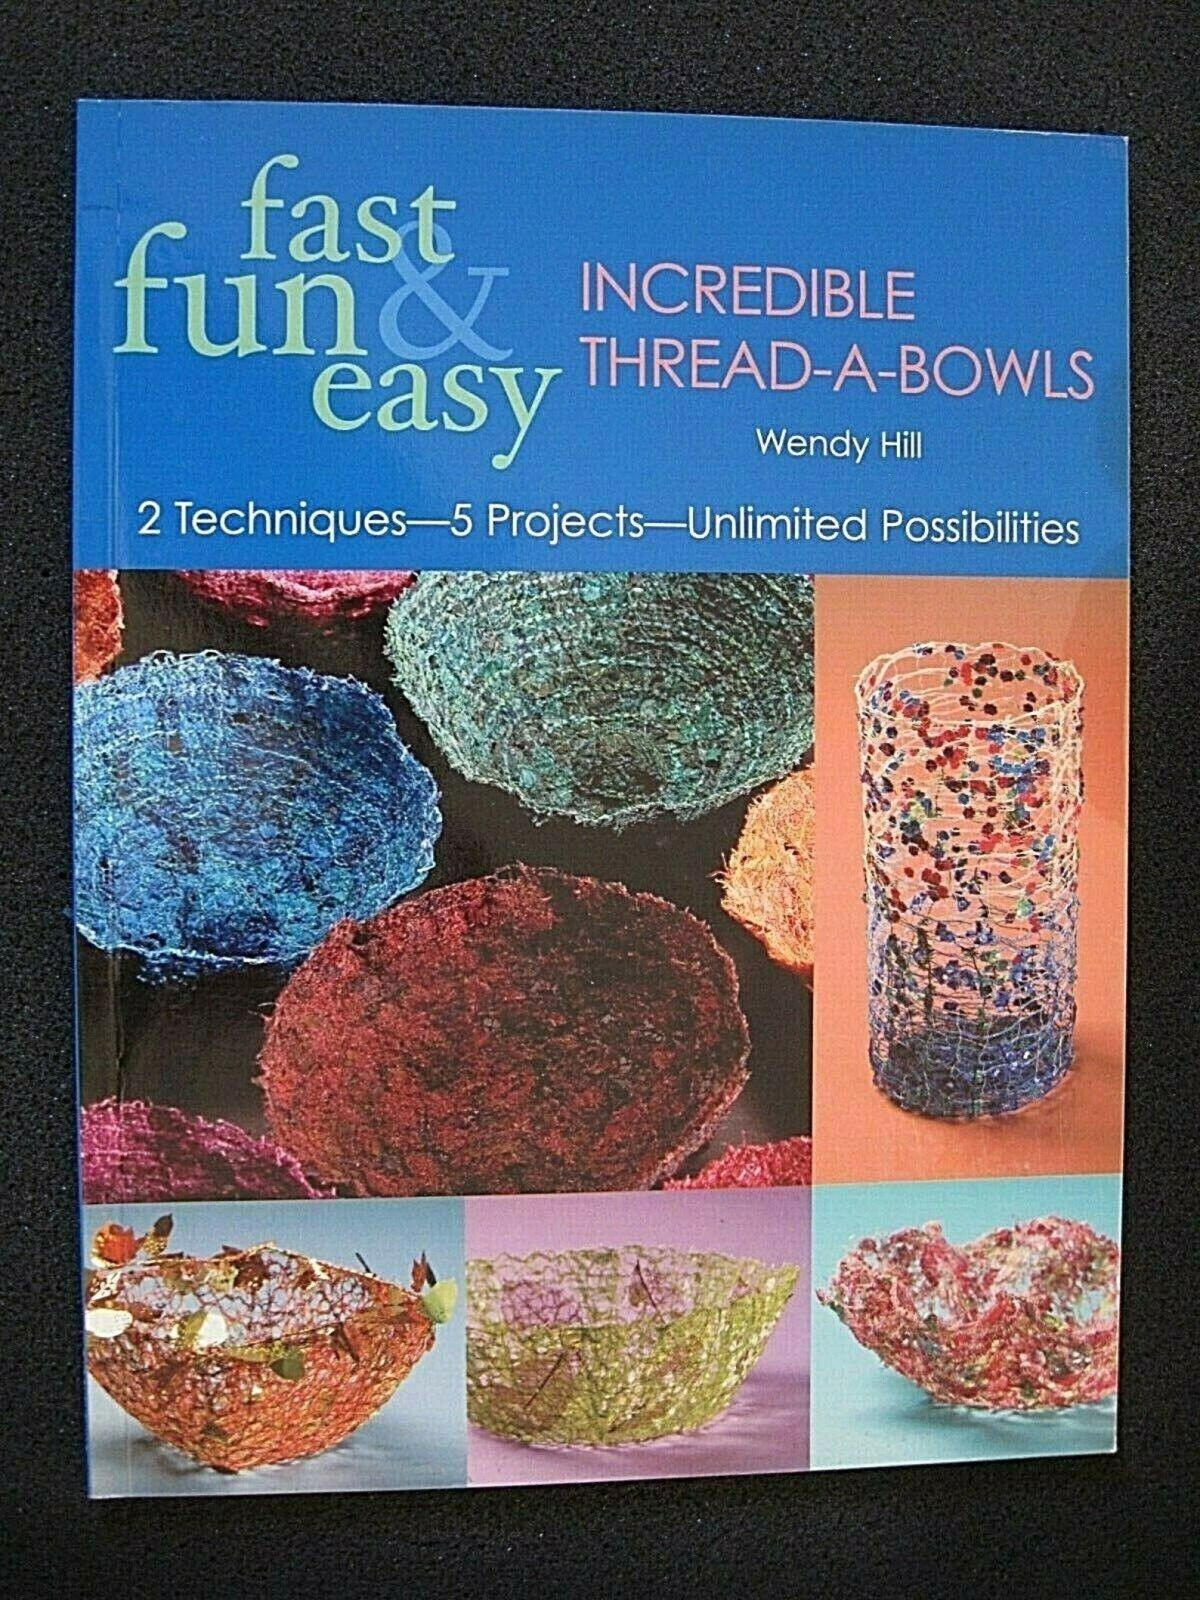 Fast, Fun, Easy & Incredible Thread-A-Bowls